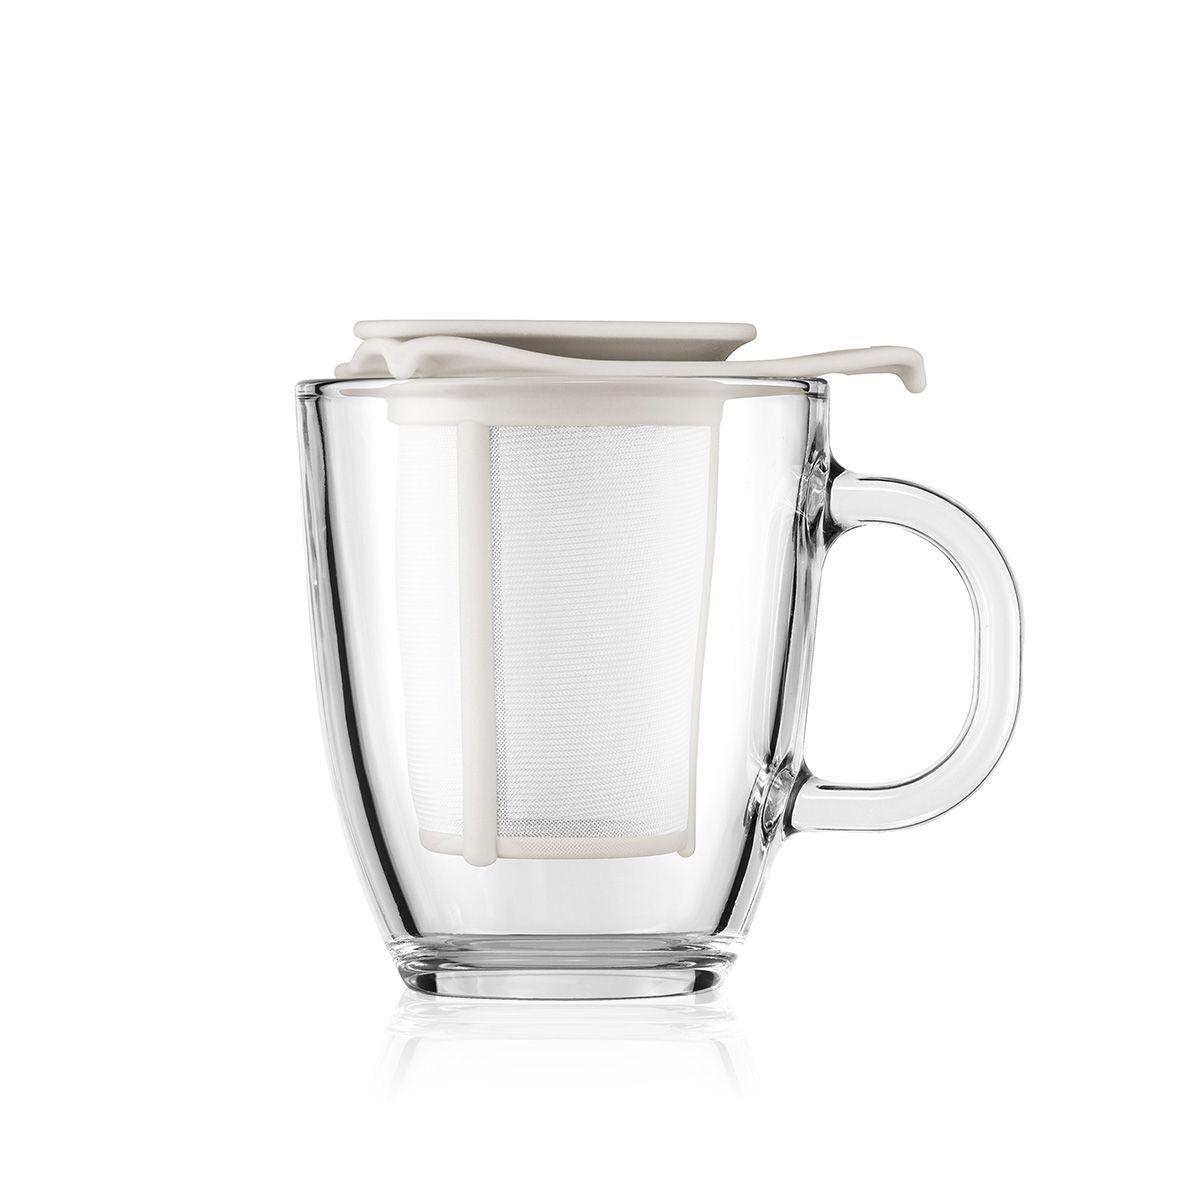 mug with tea infuser - Bodum